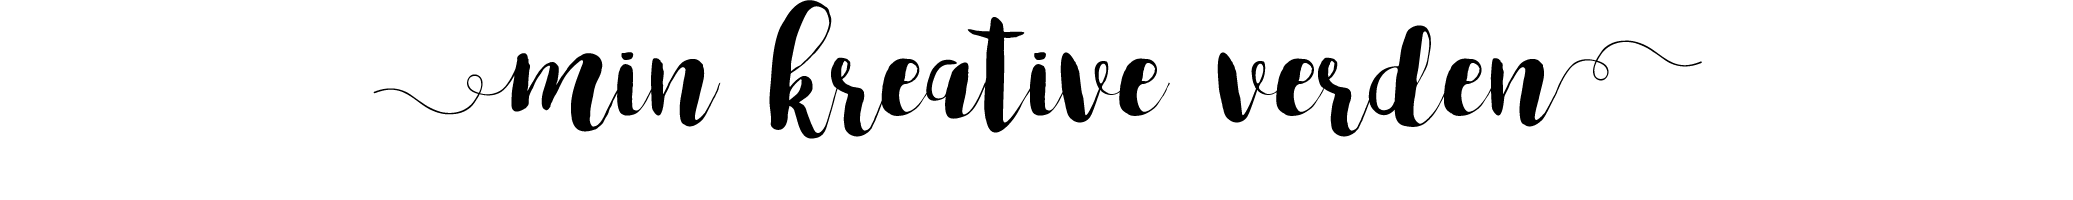 Min Kreative verden logo